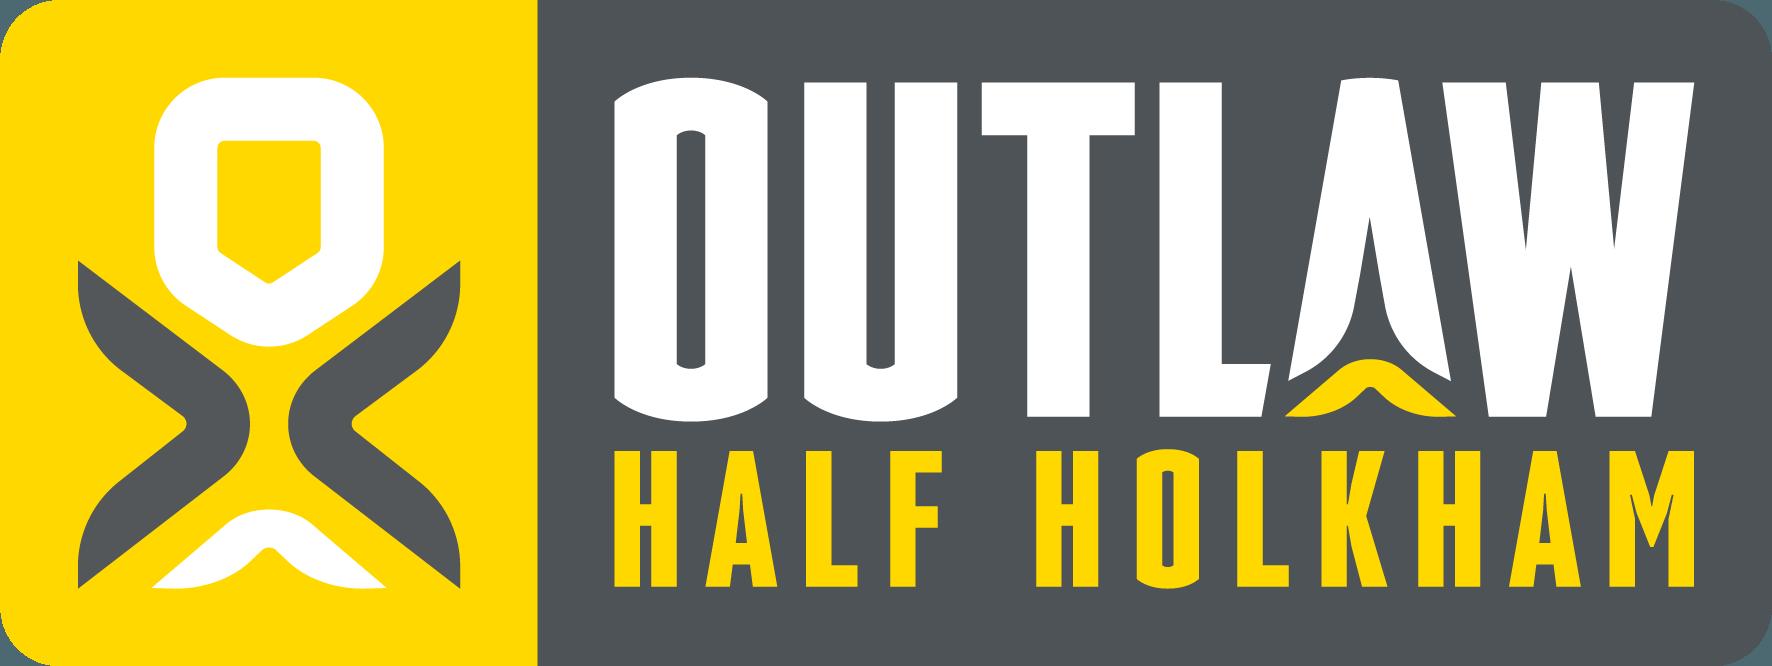 Outlaw Half Holkham 2021